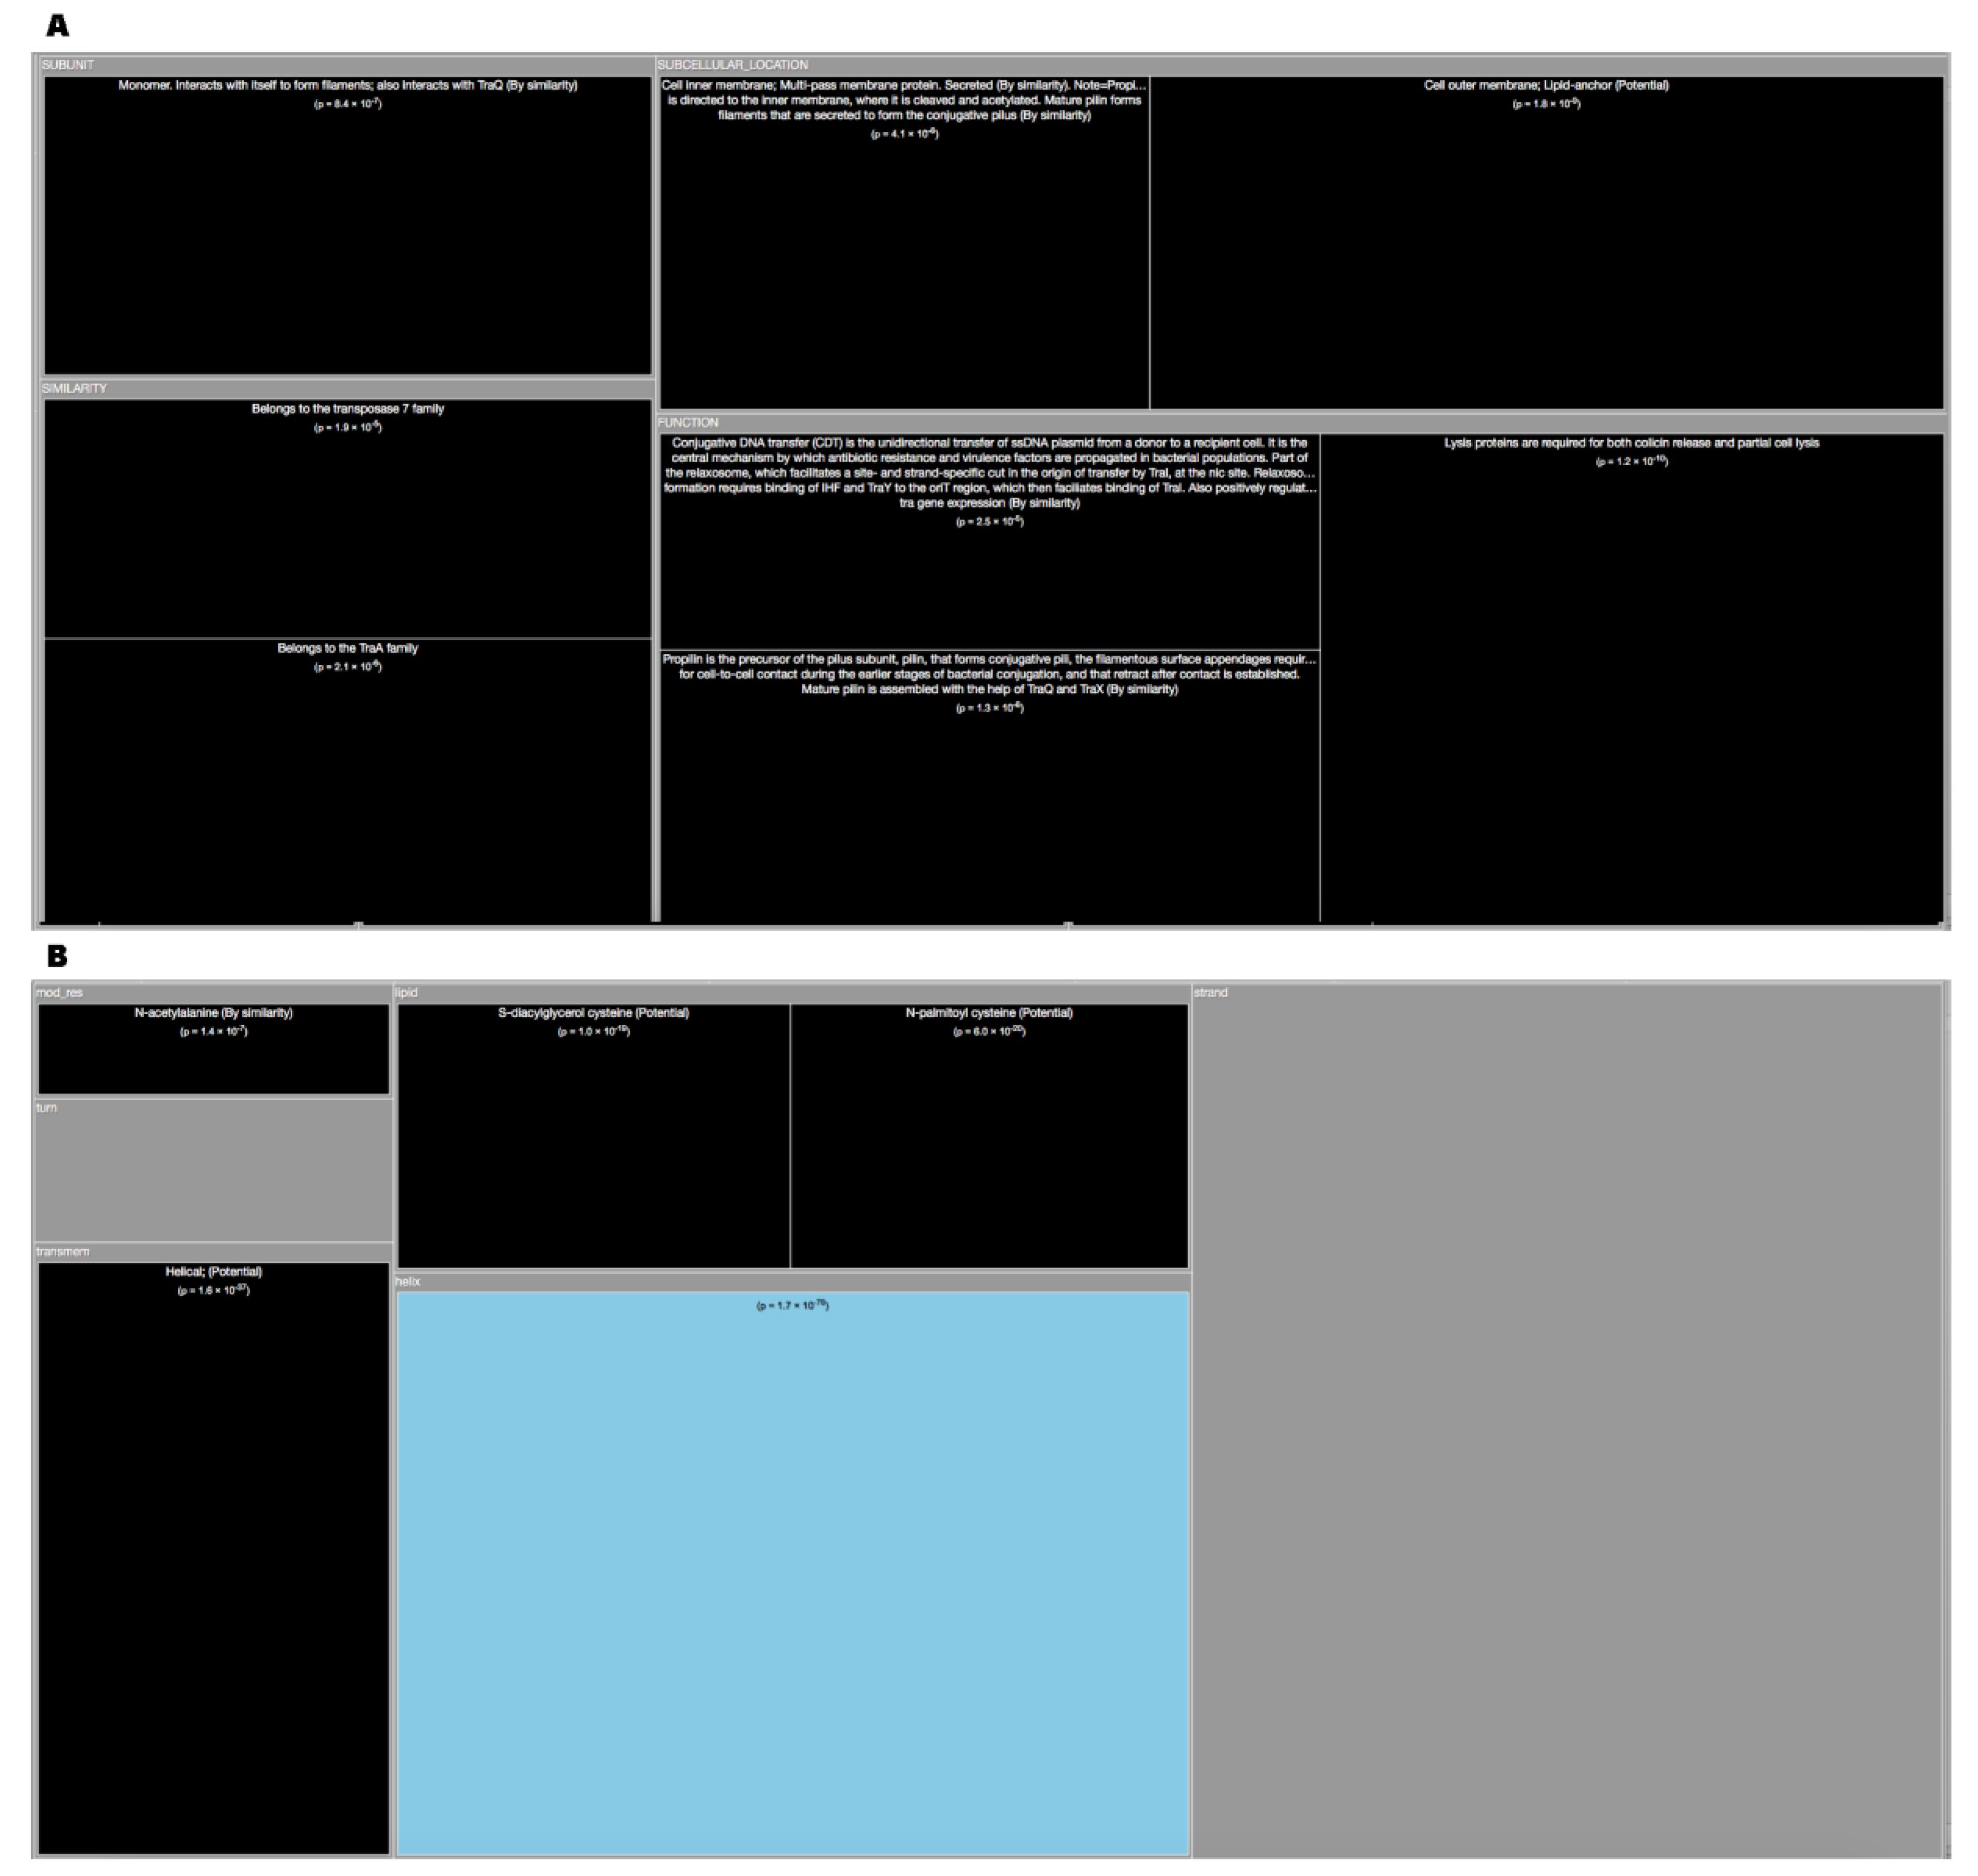 High-Throughput | Free Full-Text | Dark Proteome Database